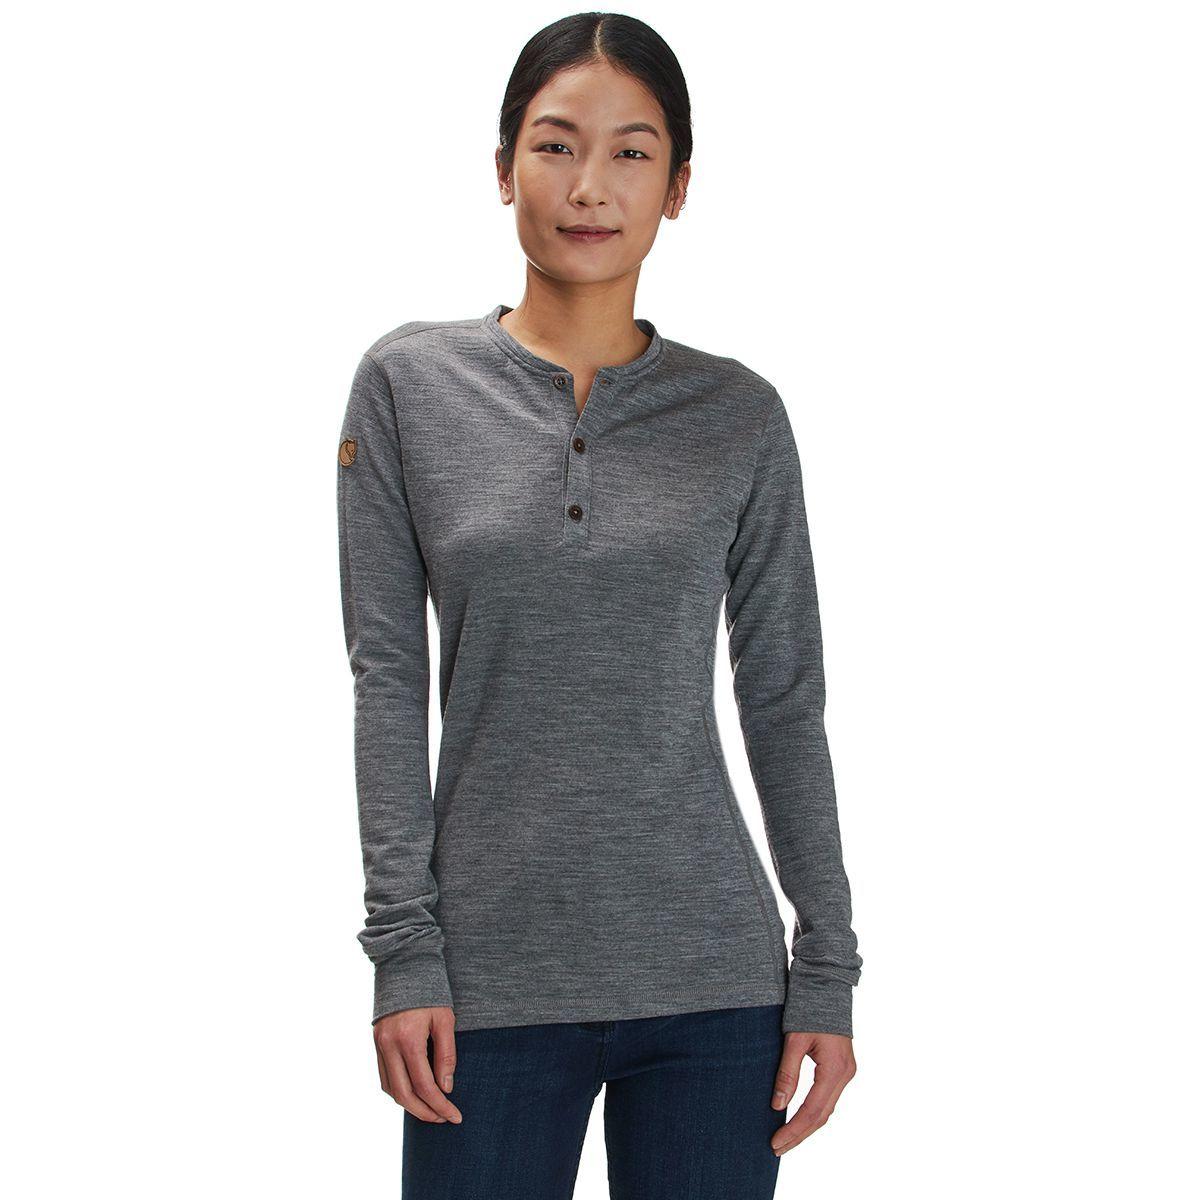 Fjallraven Lappland Merino Henley Shirt - Long-Sleeve - Women's